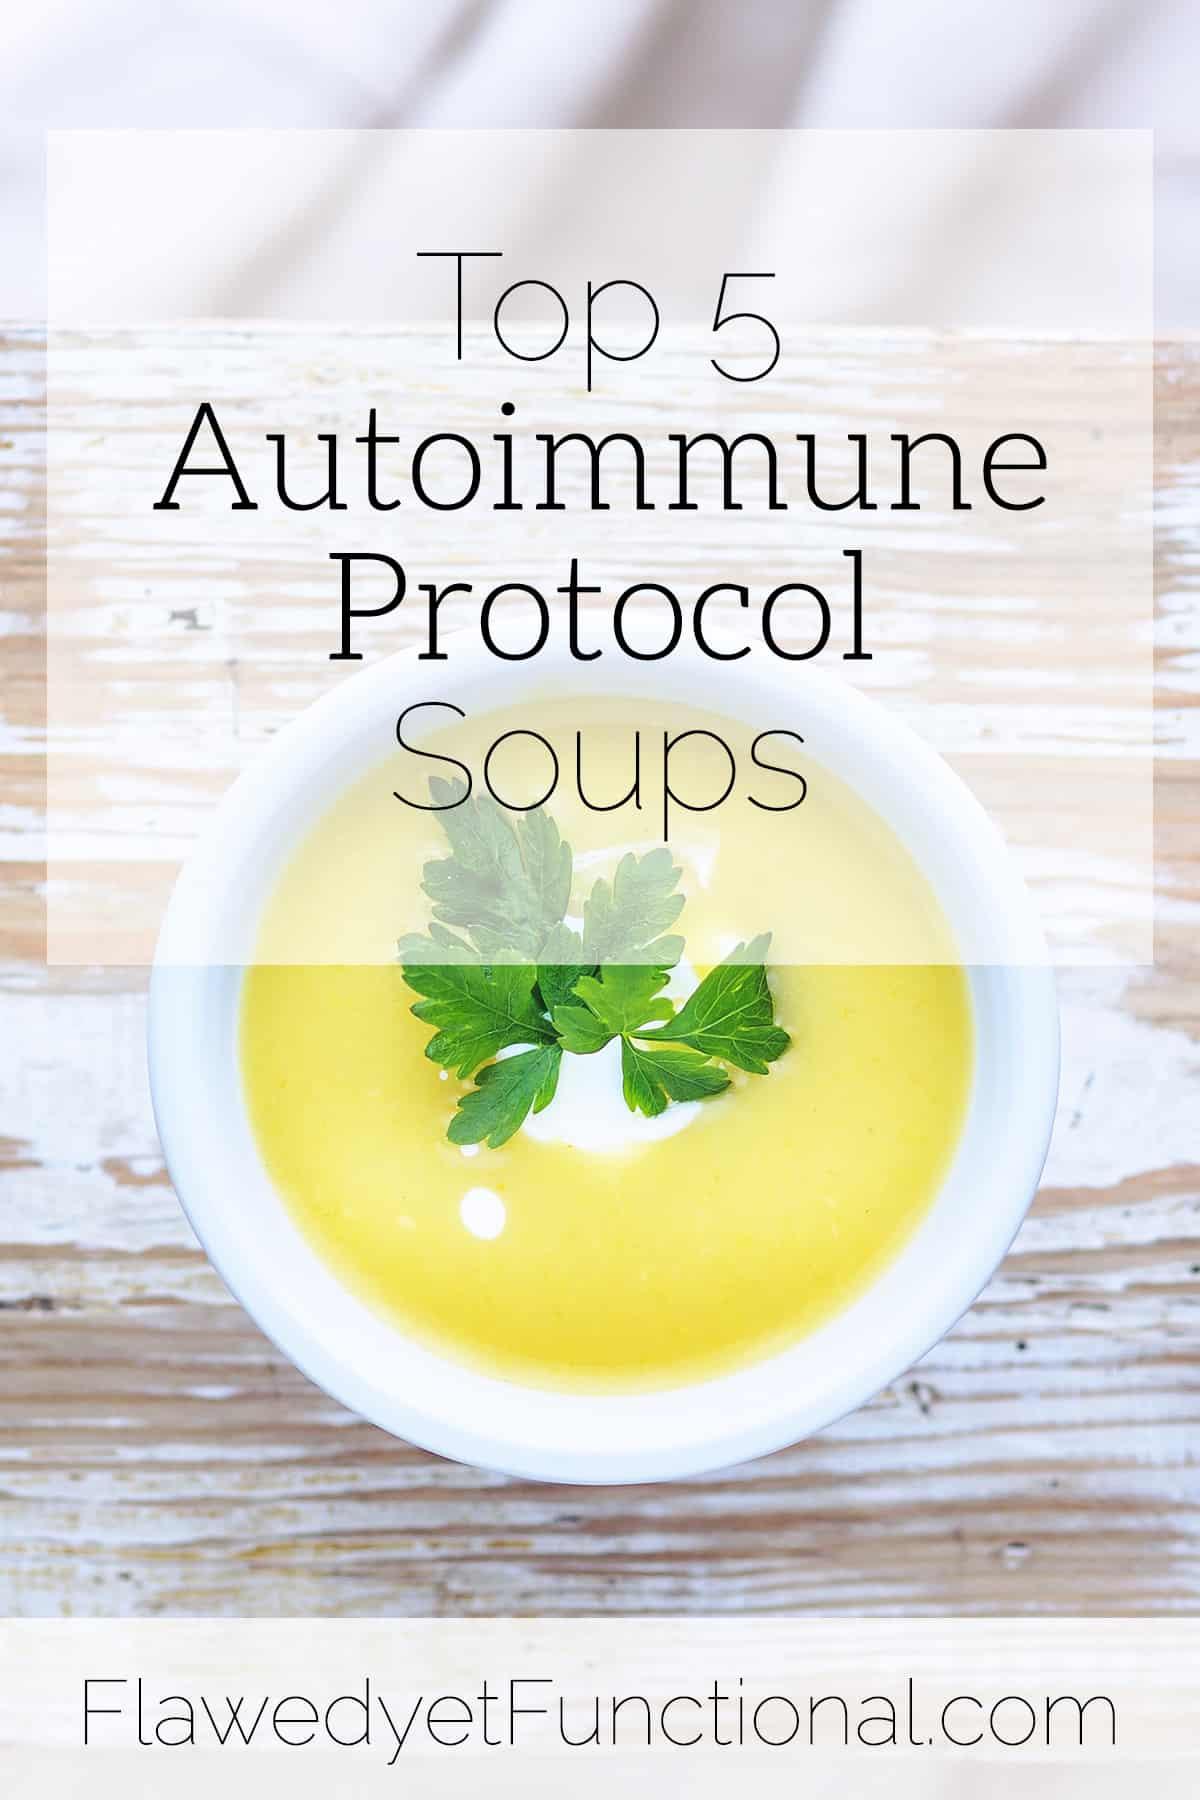 Top 5 Autoimmune Protocol Soups | Tried & True Recipes